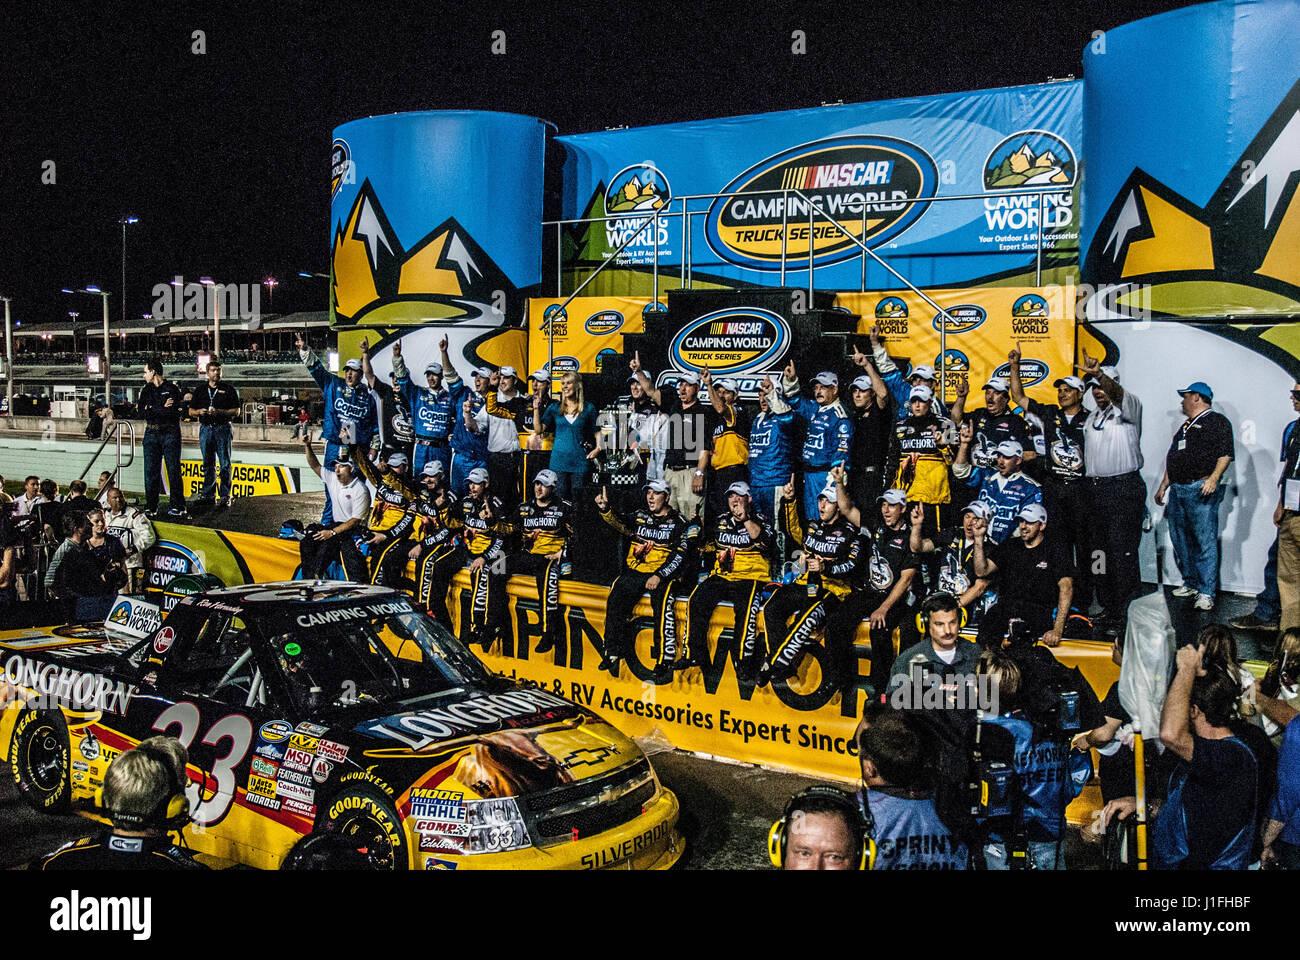 NASCAR racing motorsports - Stock Image